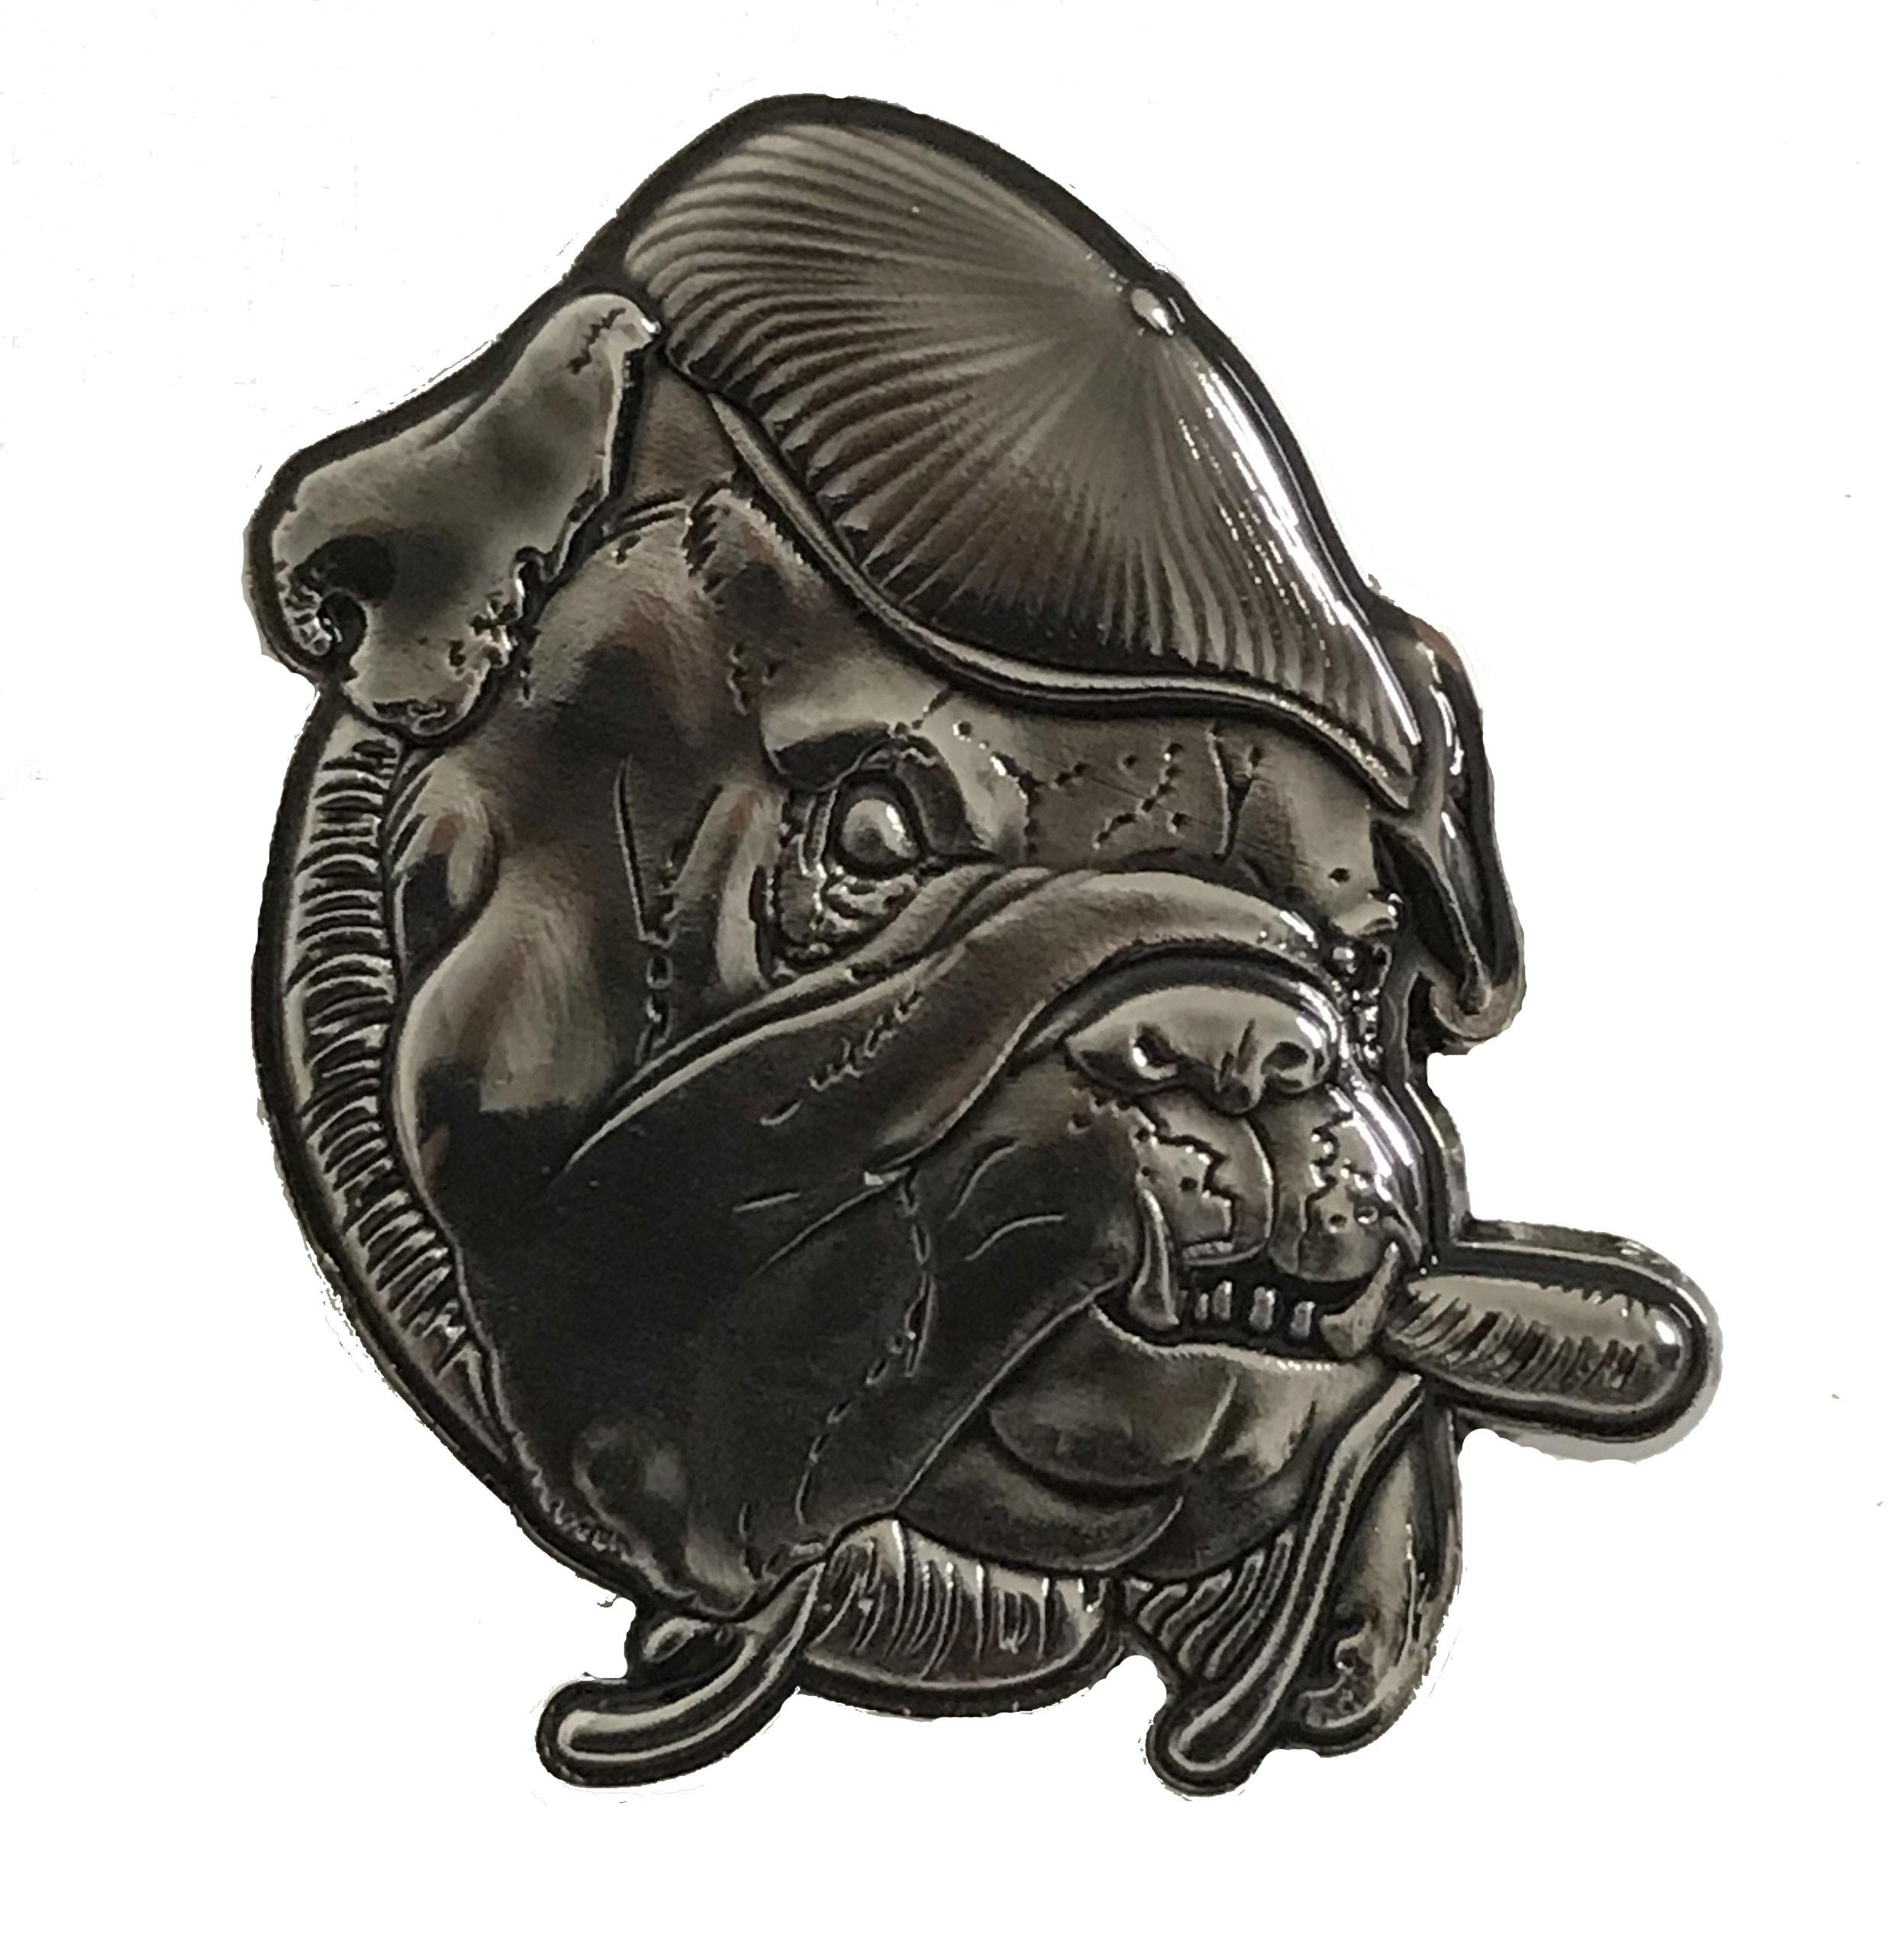 Metall-Pin - Sheer Terror